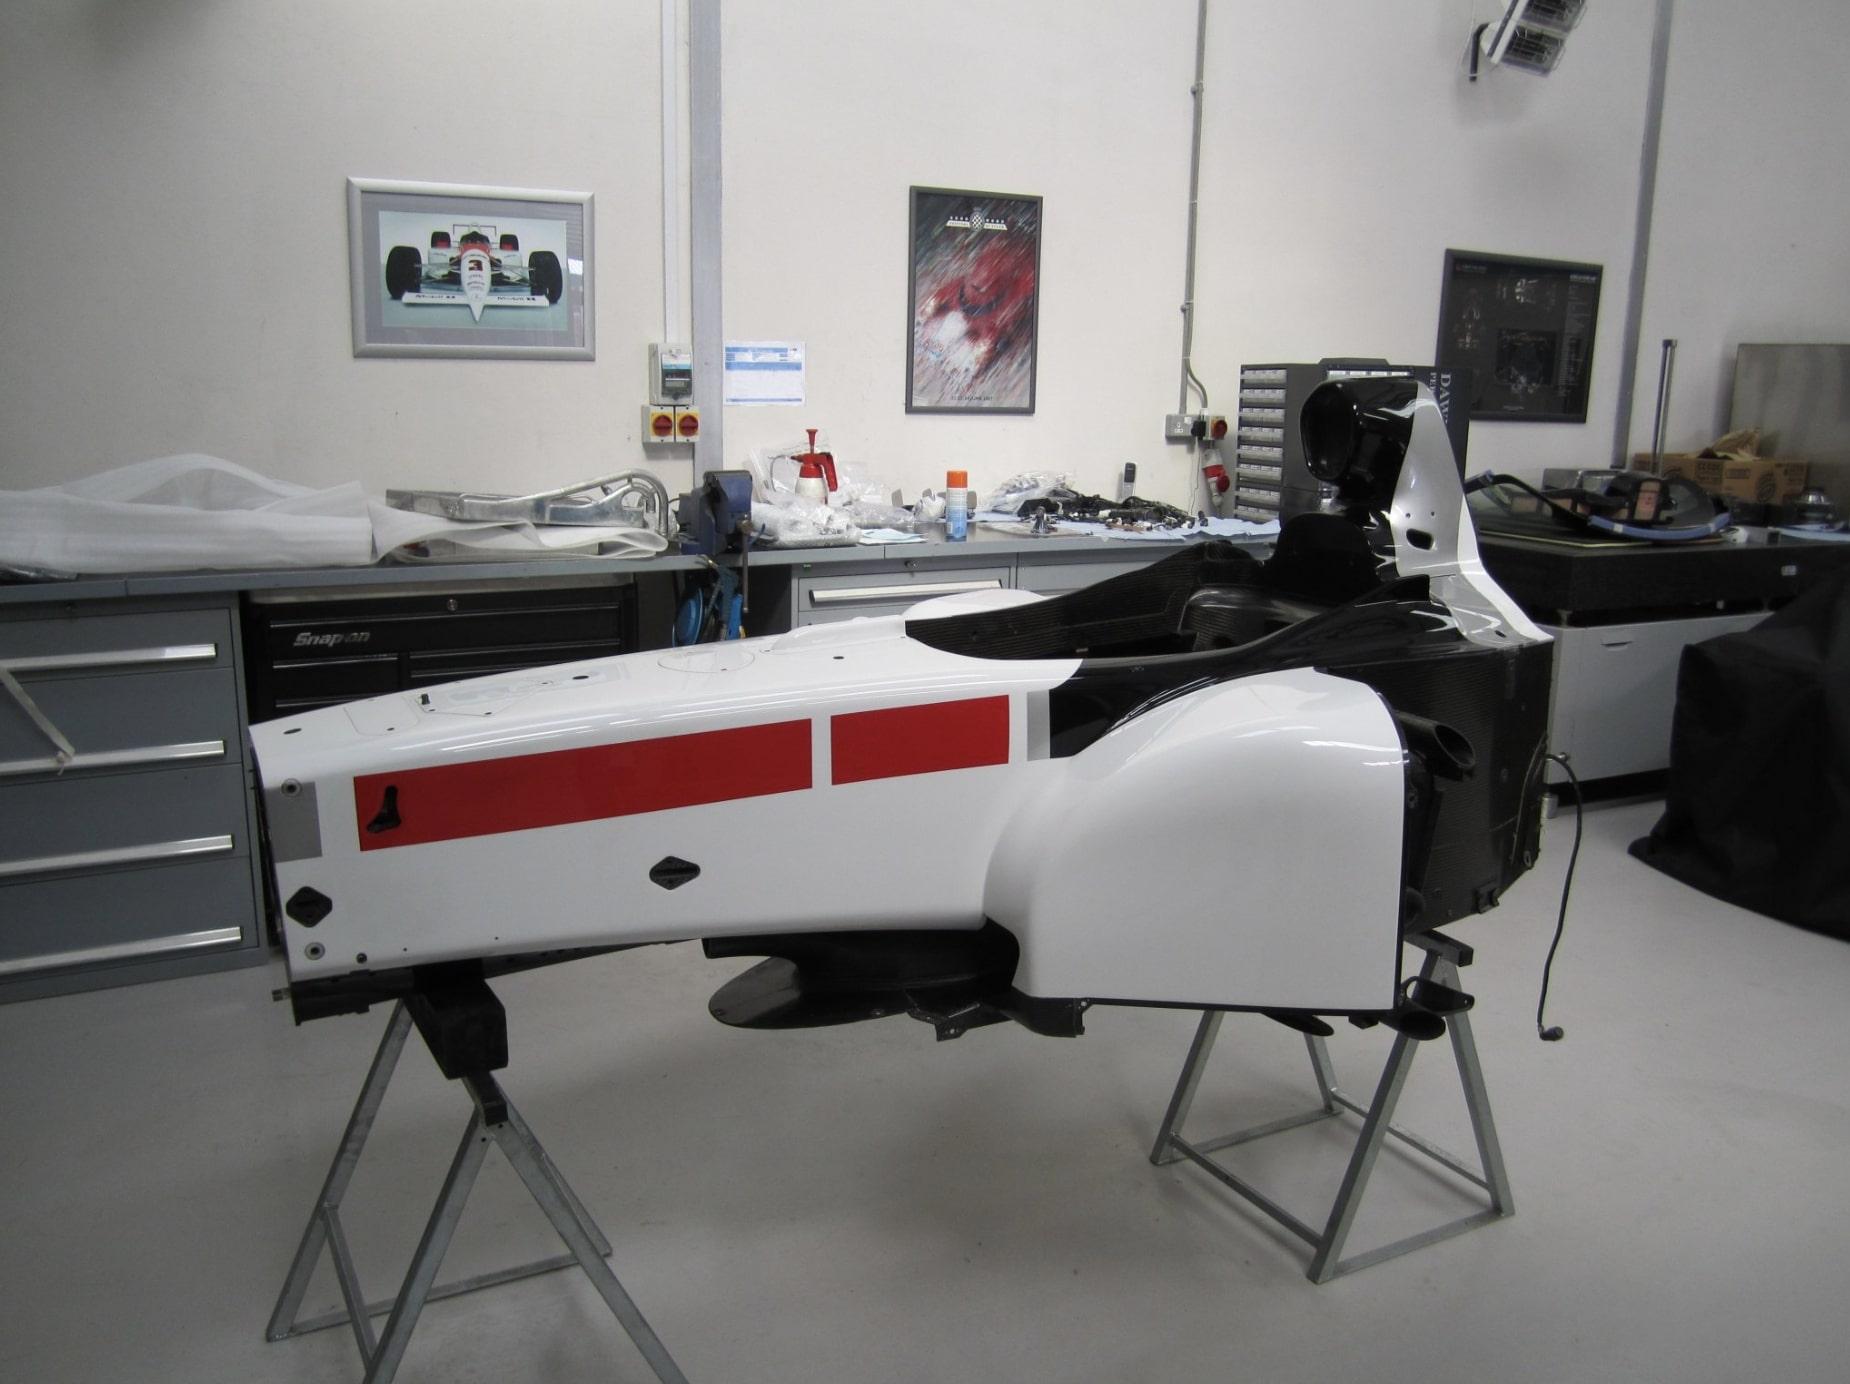 BAR-Honda Bonneville (11)